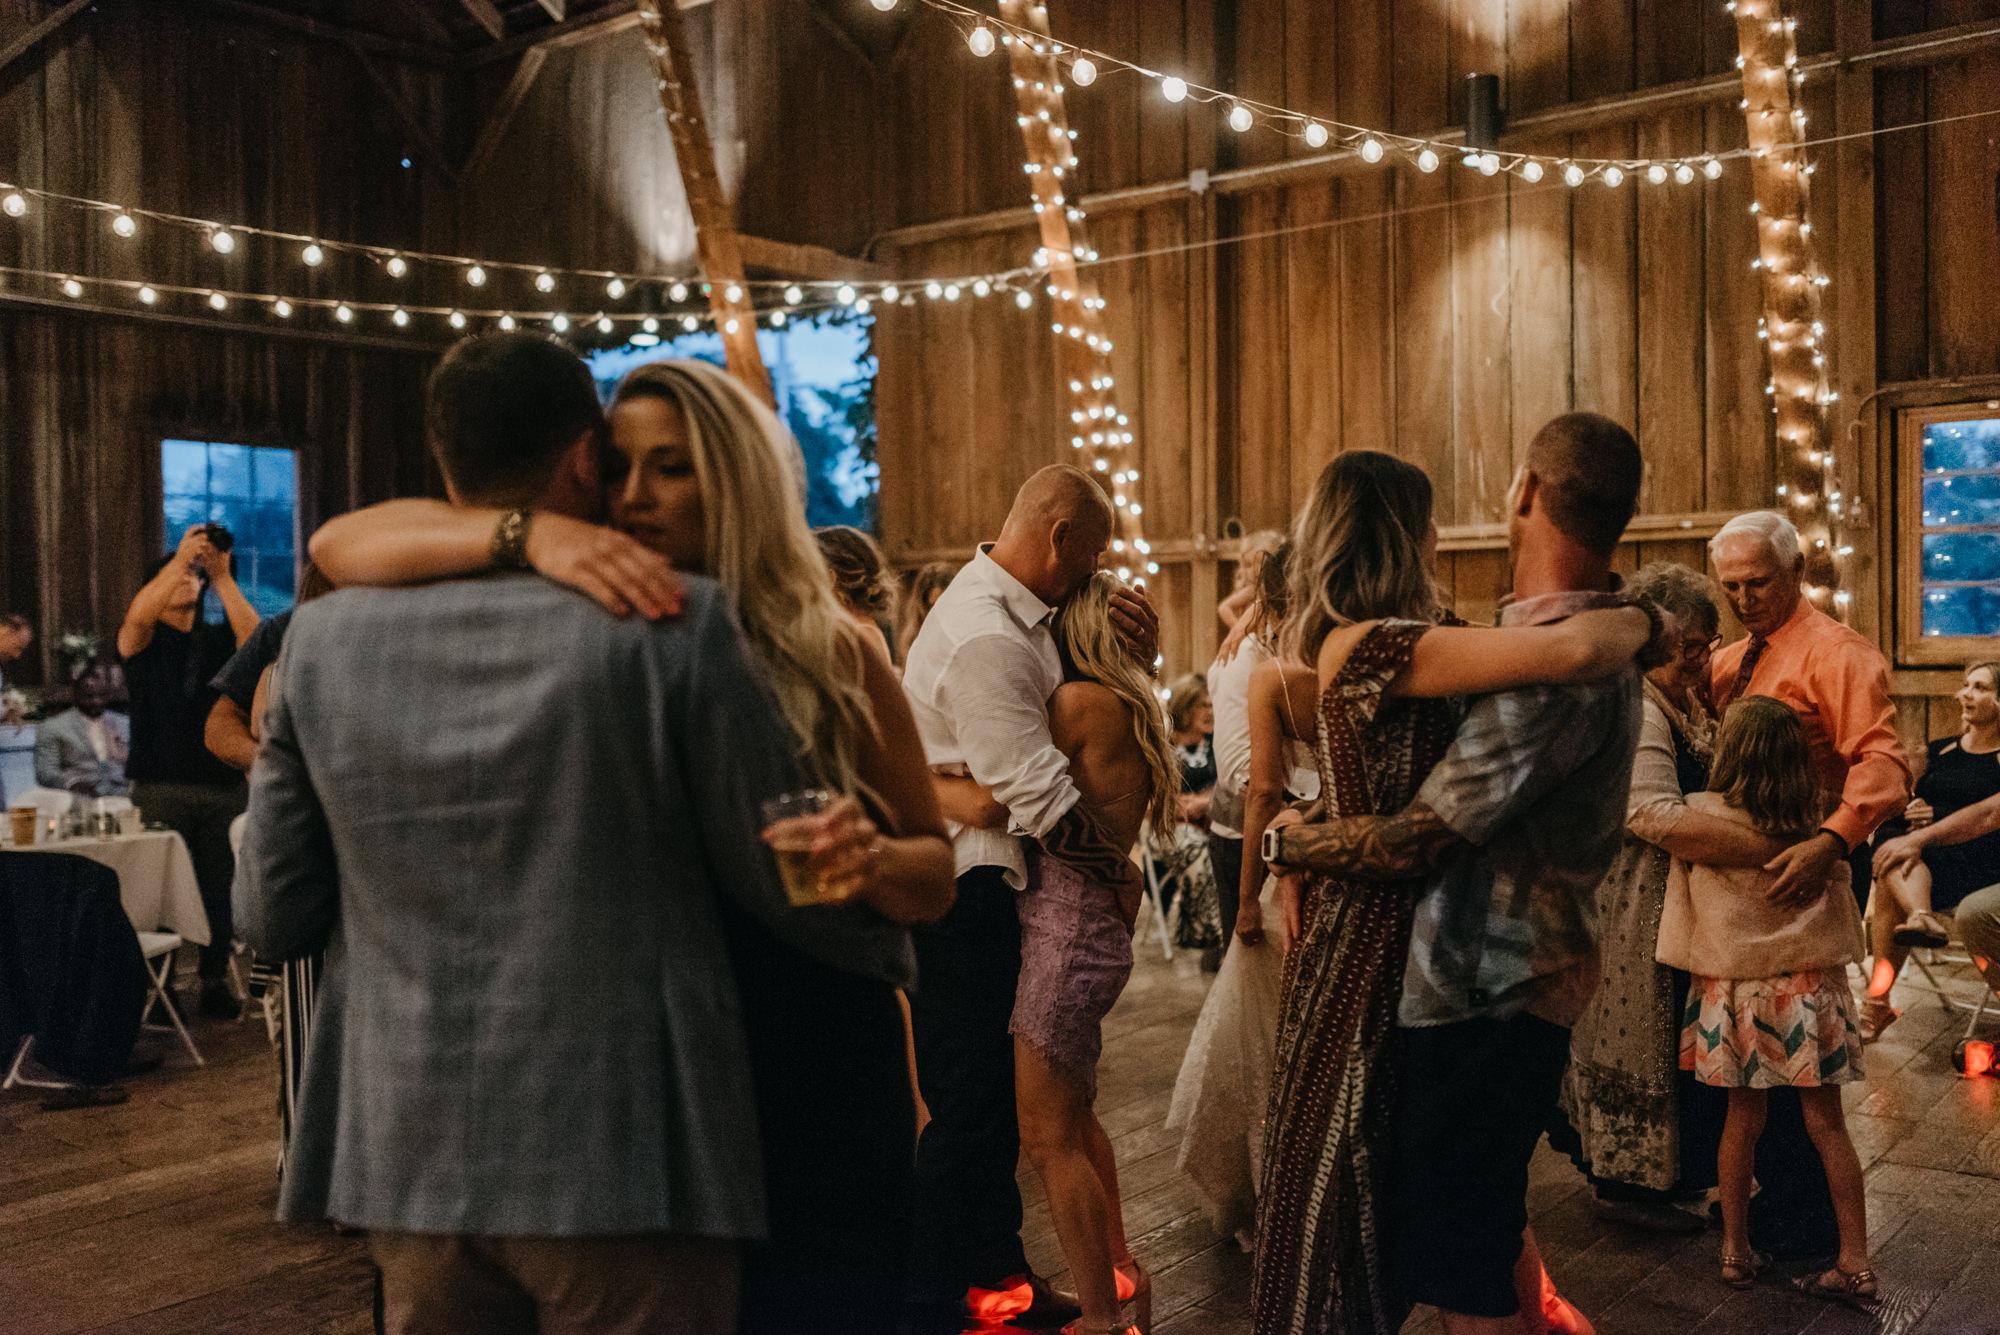 215-portland-northwest-wedding-bubble-exit-barn-string-lights.jpg